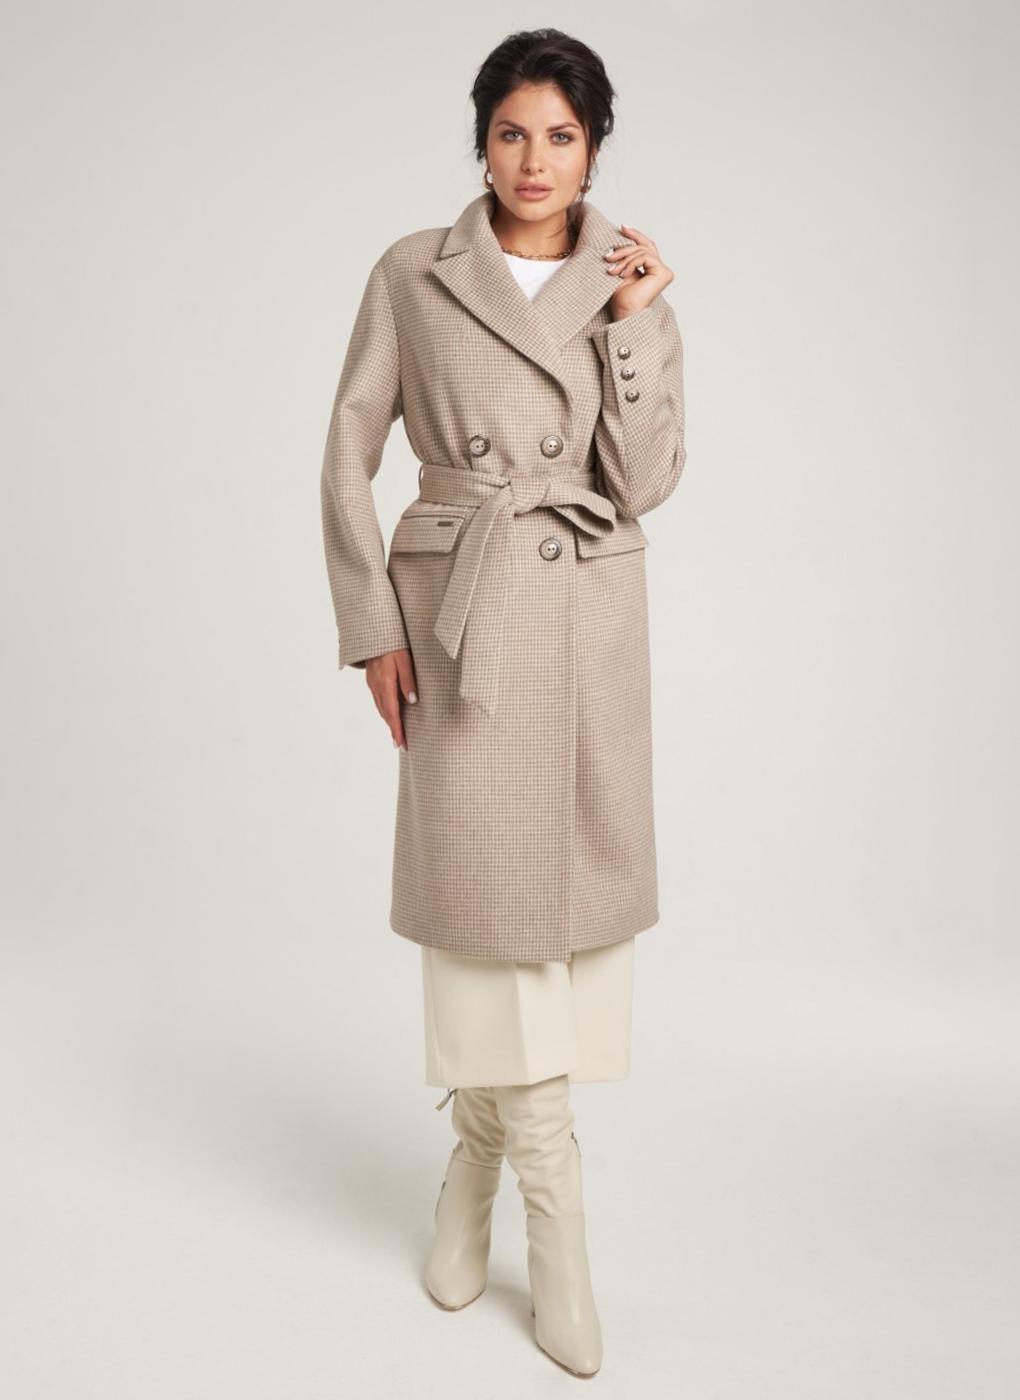 Пальто прямое шерстяное 73, idekka фото